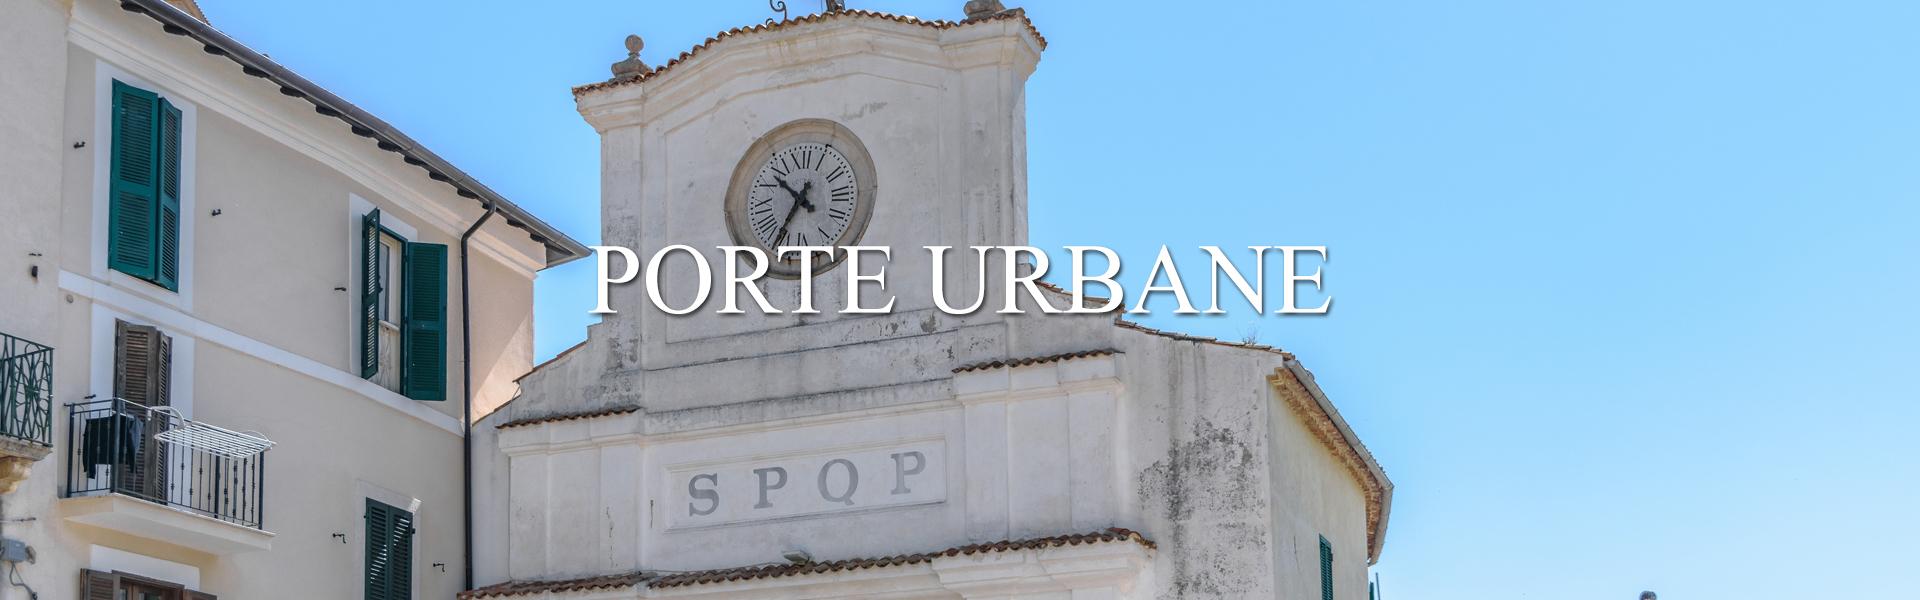 porte-urbane-1920x600